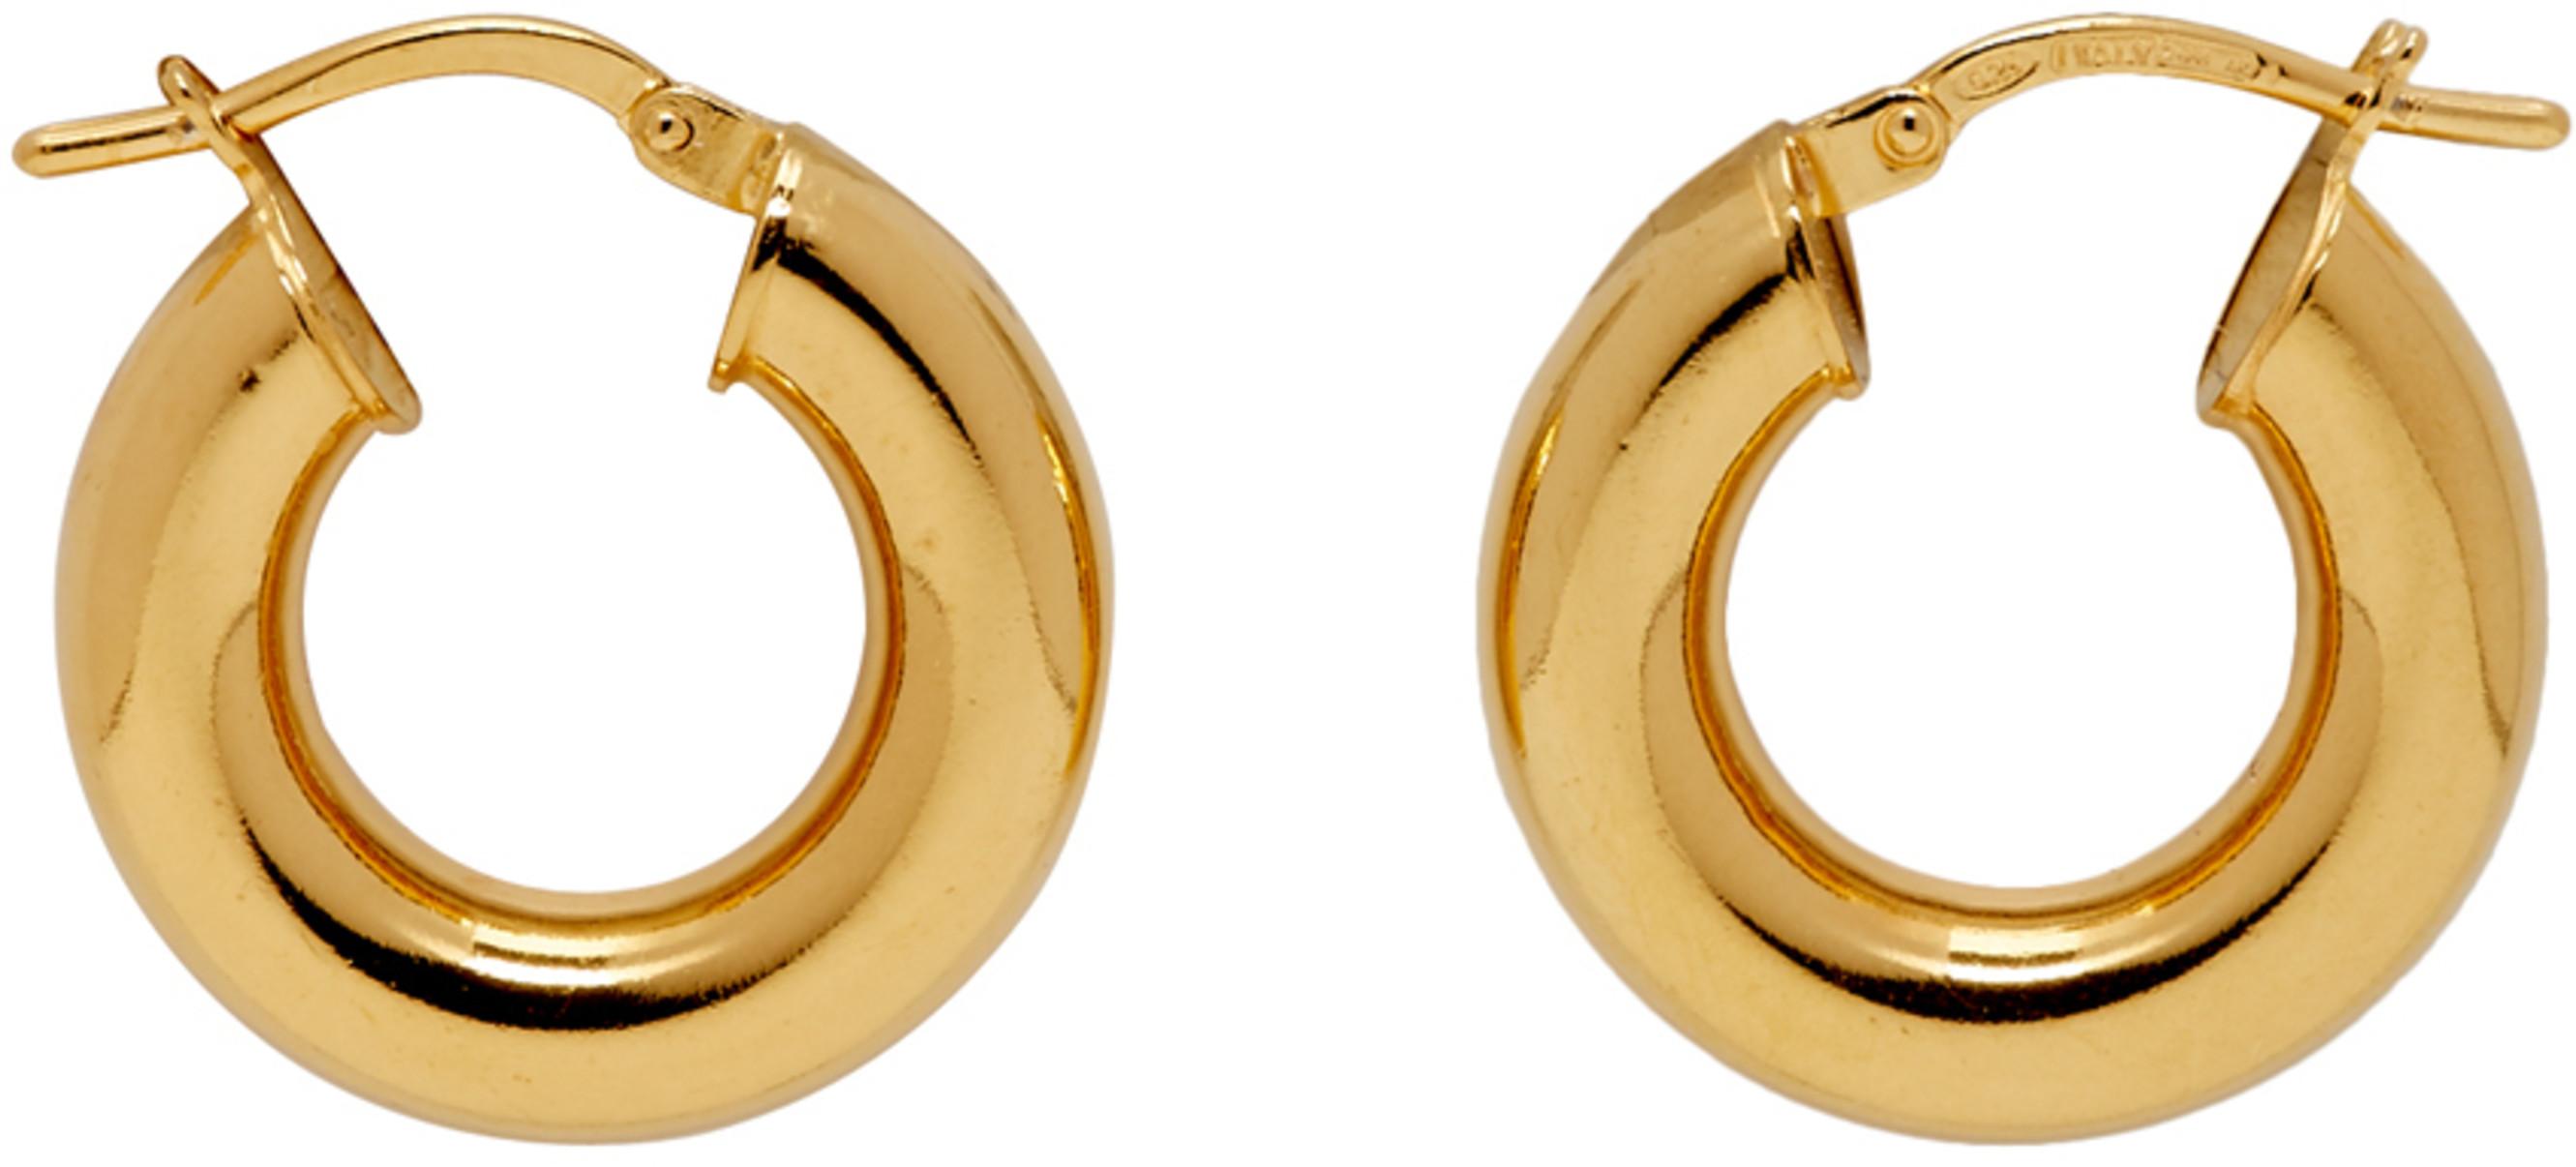 b815d206e6fd7 Gold Tiny Everyday Hoop Earrings